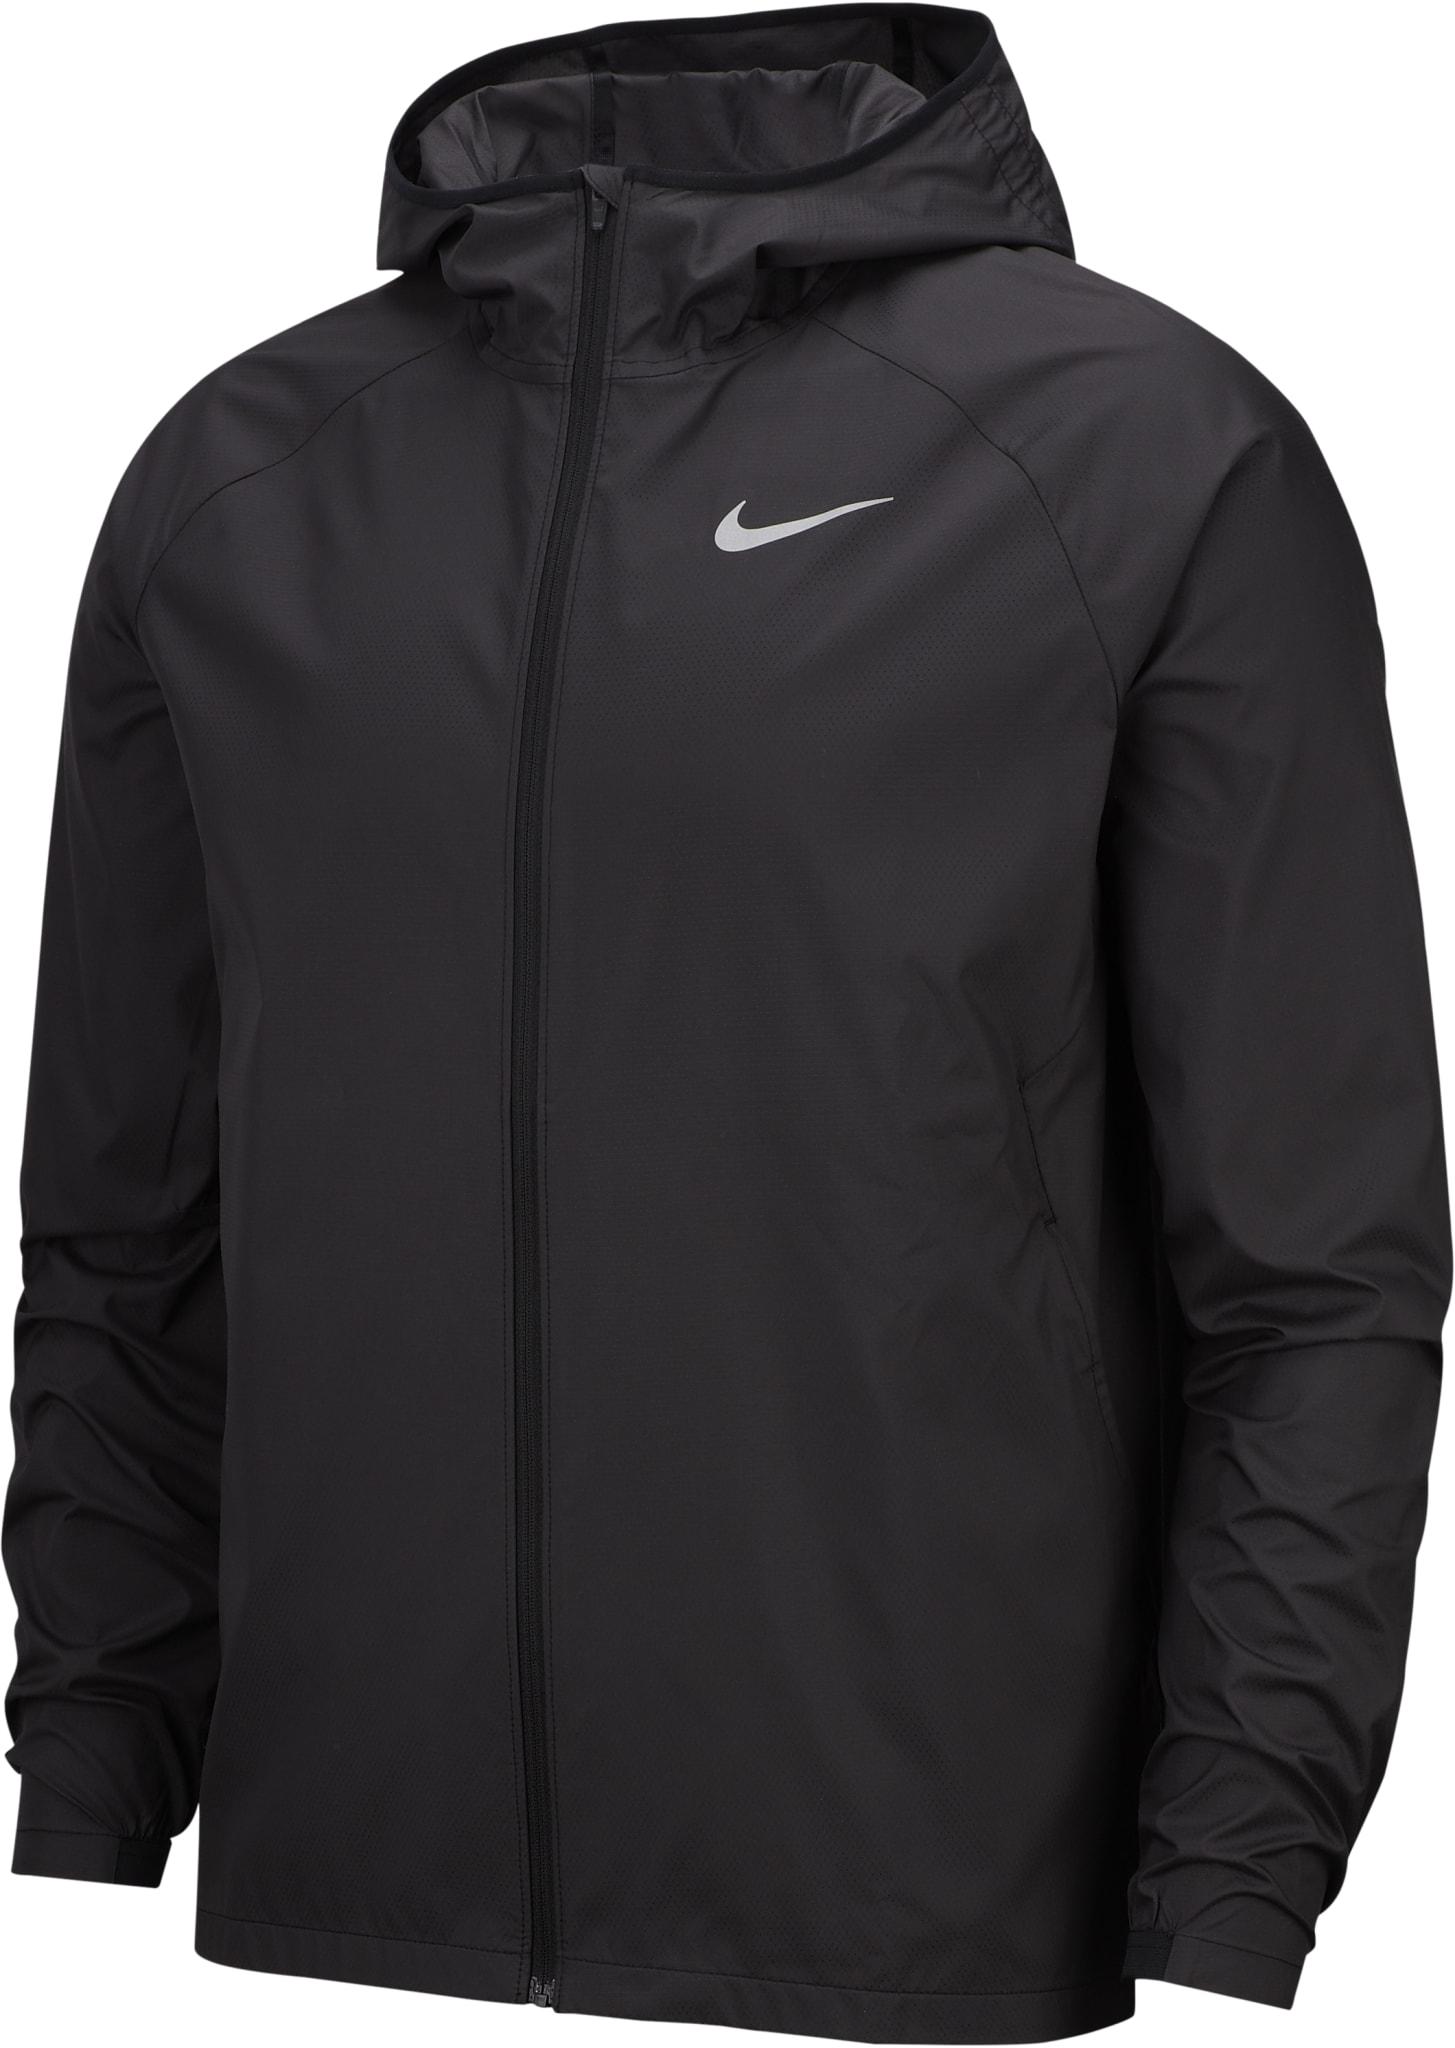 Essential Jacket M